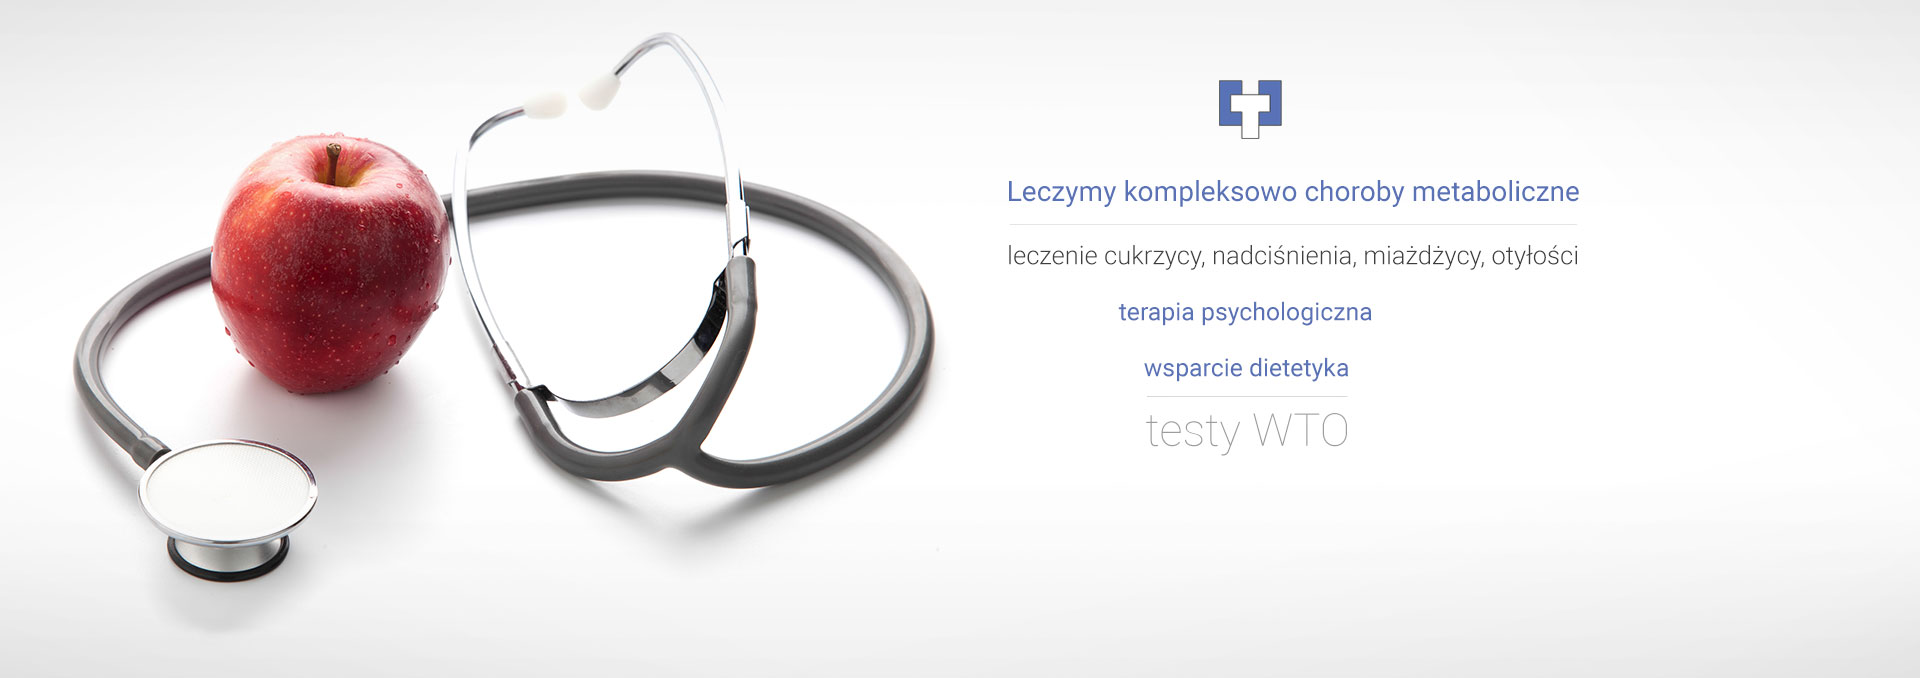 baner glowna dietetyka - HTC